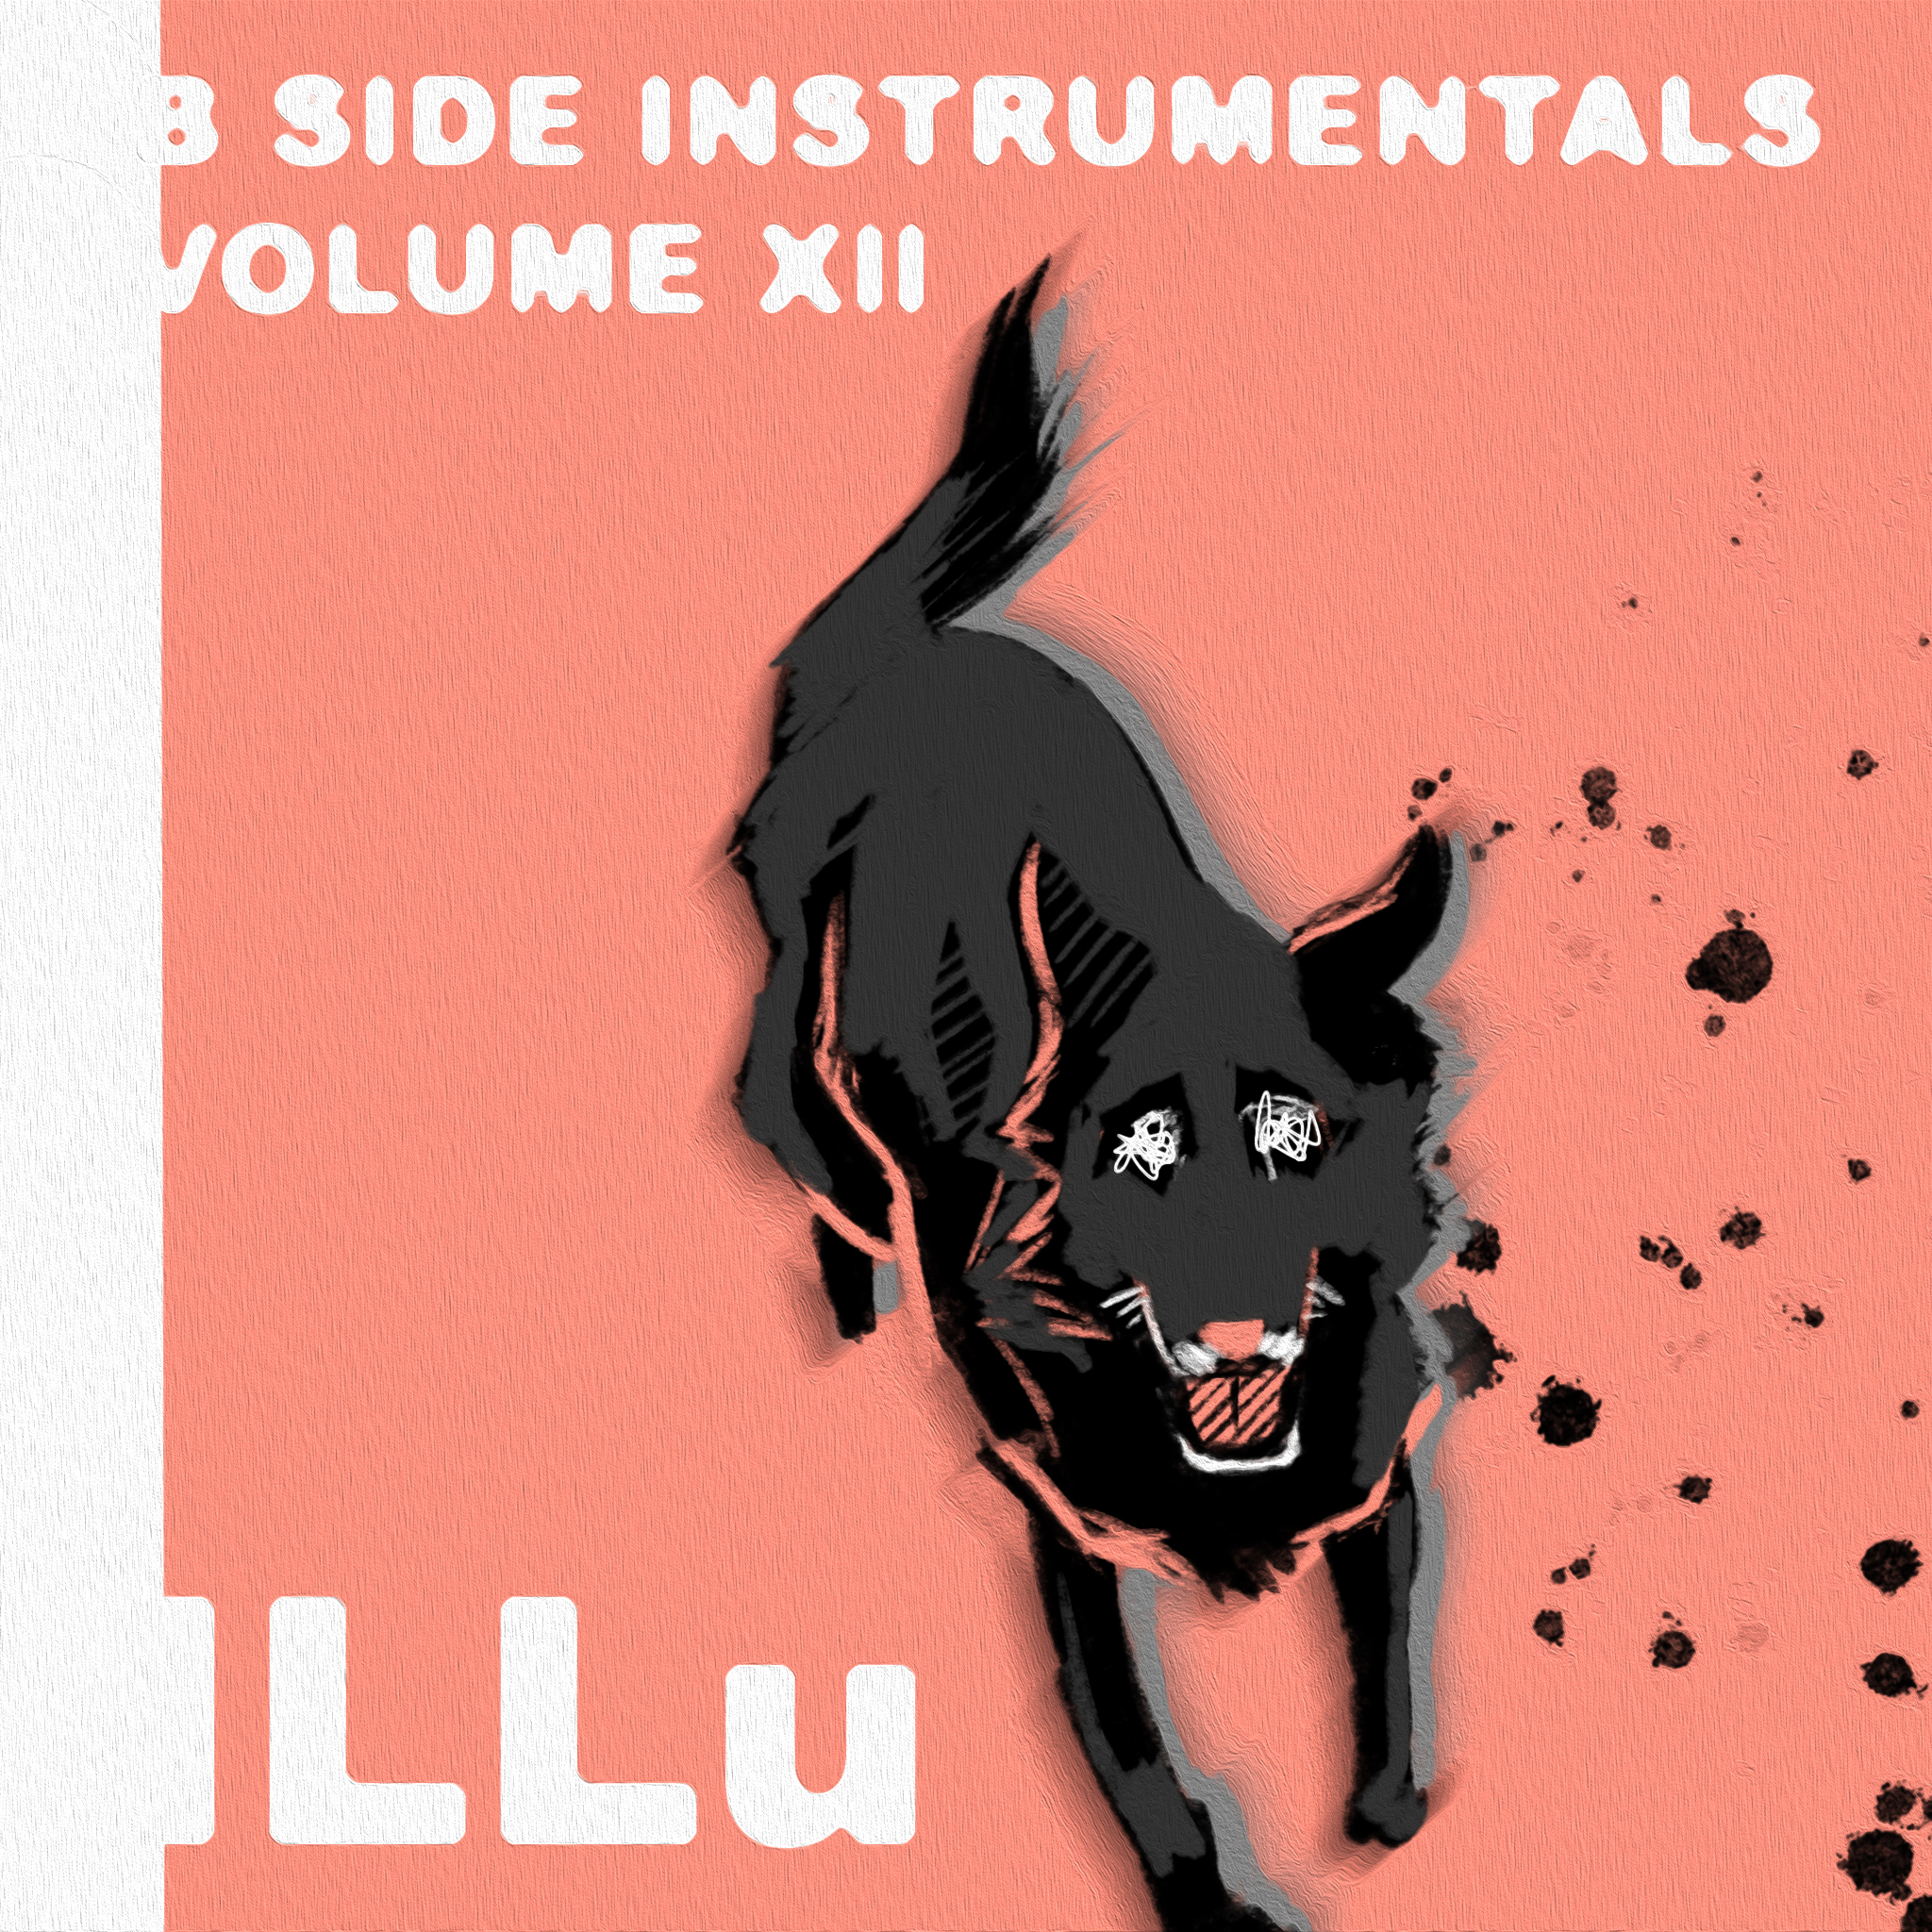 ILLu Cover.jpg